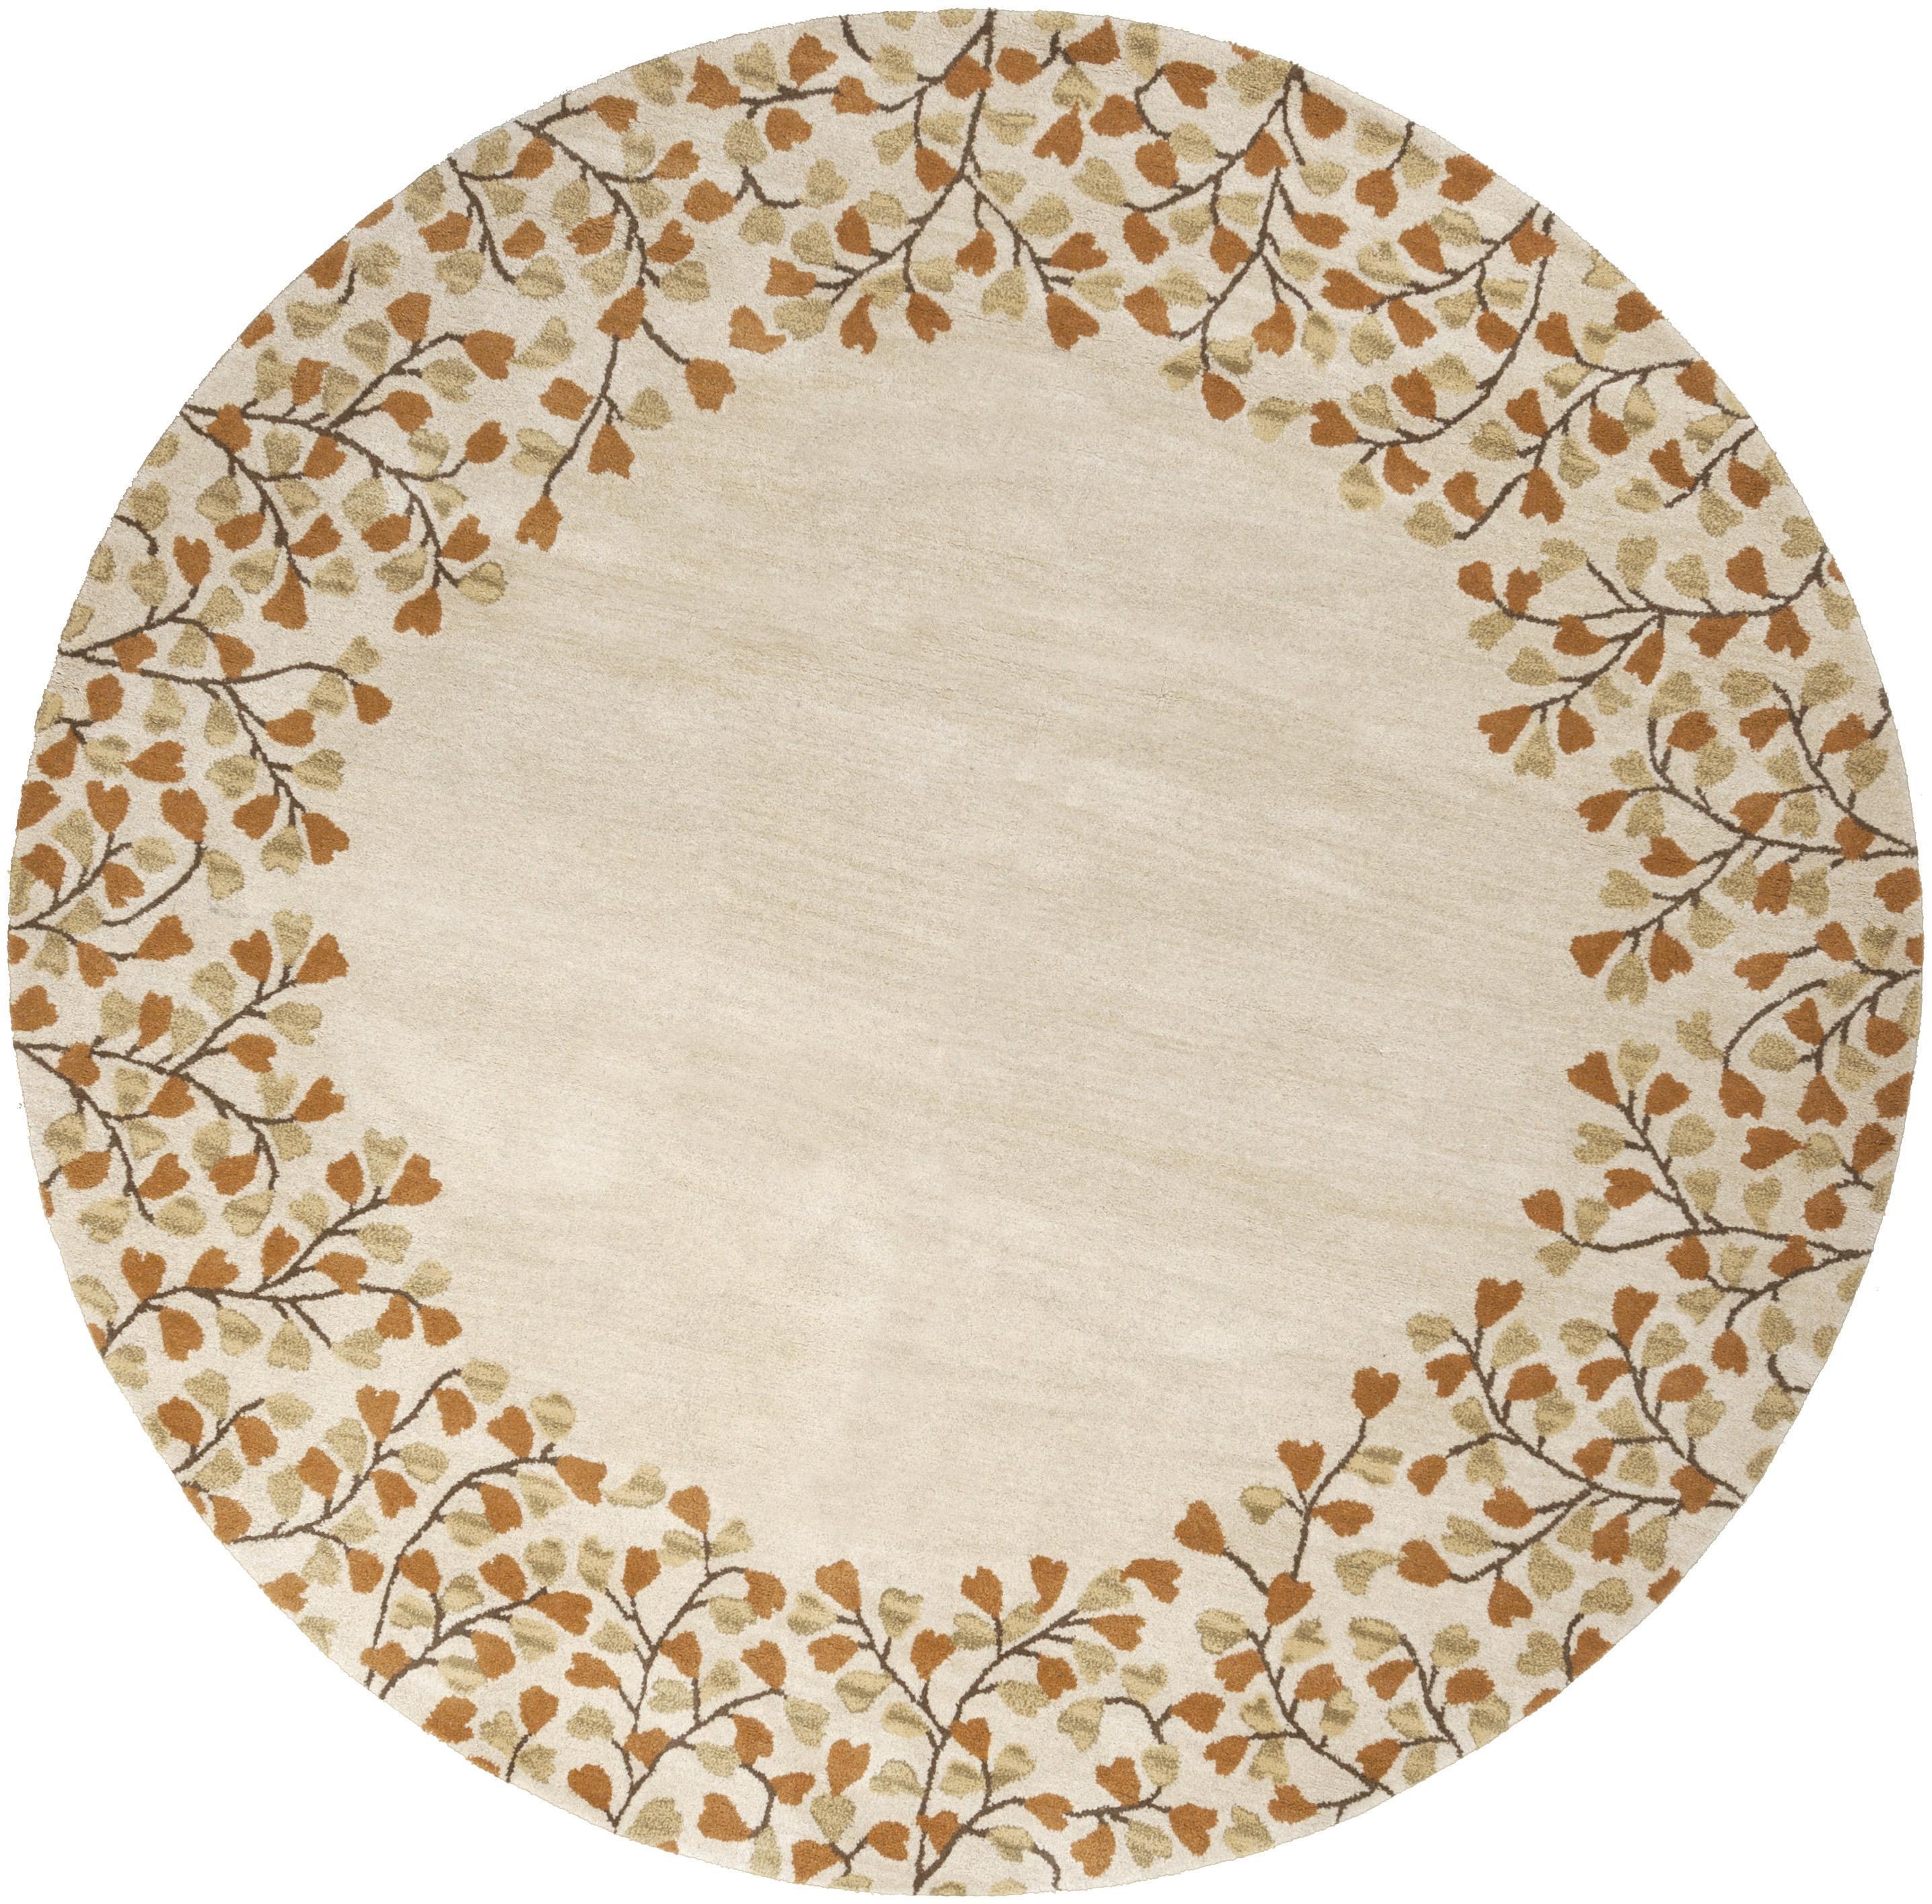 Surya Rugs Athena 4' Round - Item Number: ATH5118-4RD